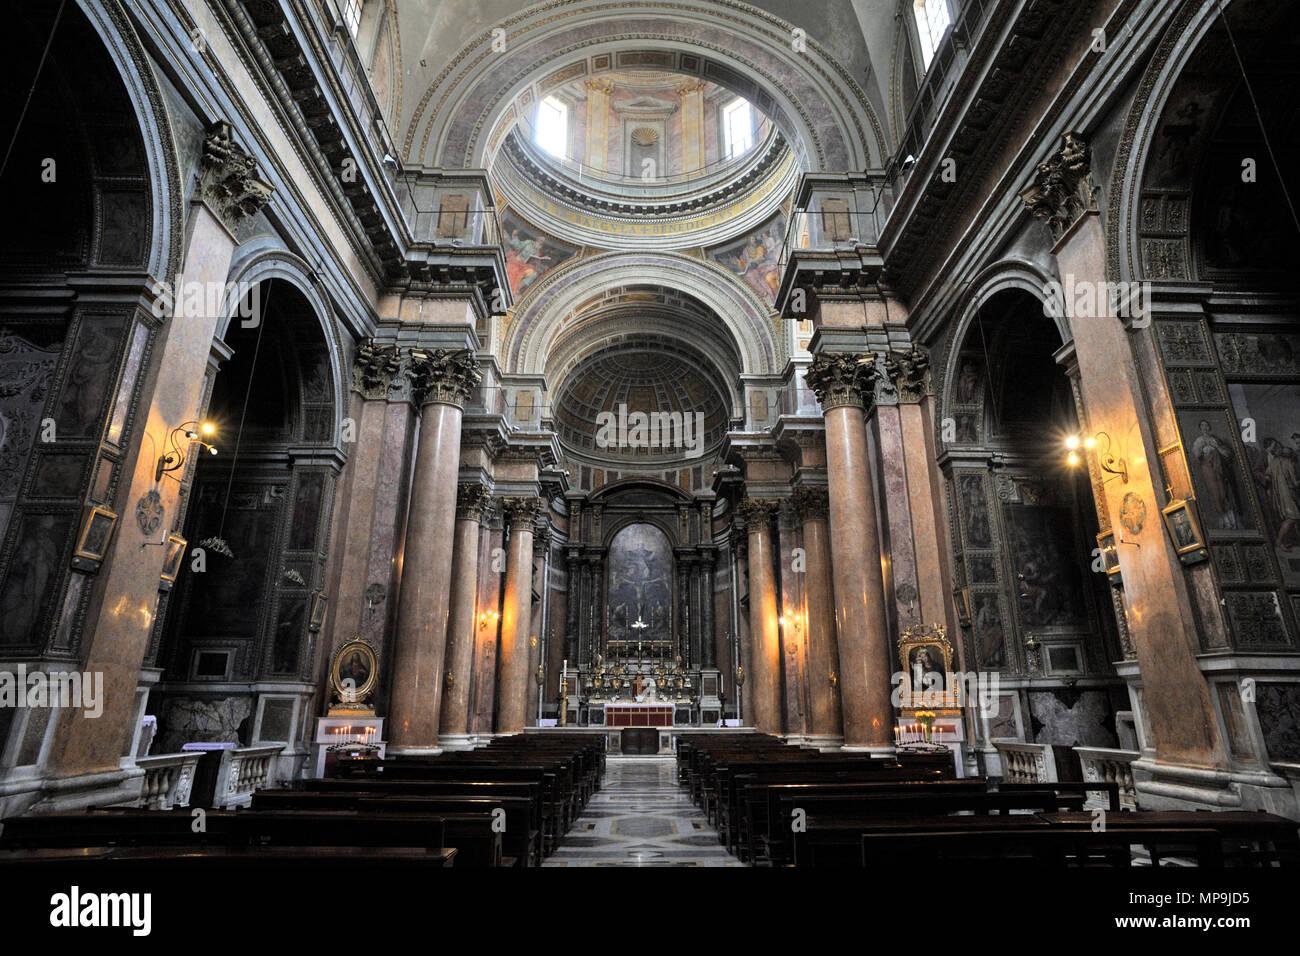 Italie, Rome, l'église de la Sainte Trinité des Pèlerins, la Santissima Trinità dei Pellegrini Photo Stock